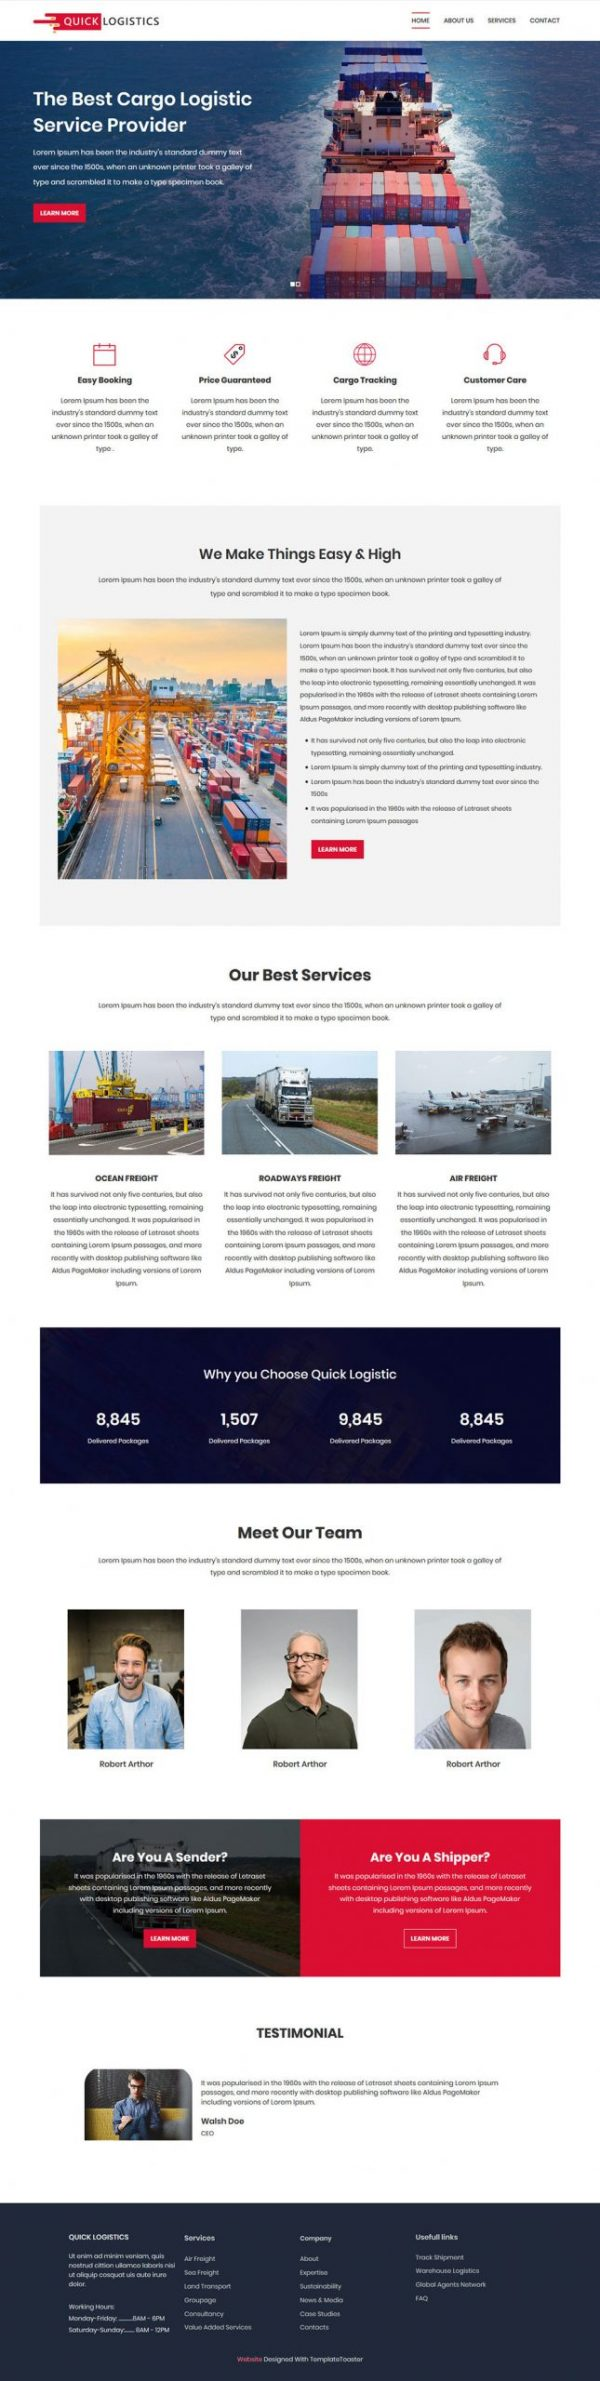 quick logistics transport and logistic html template